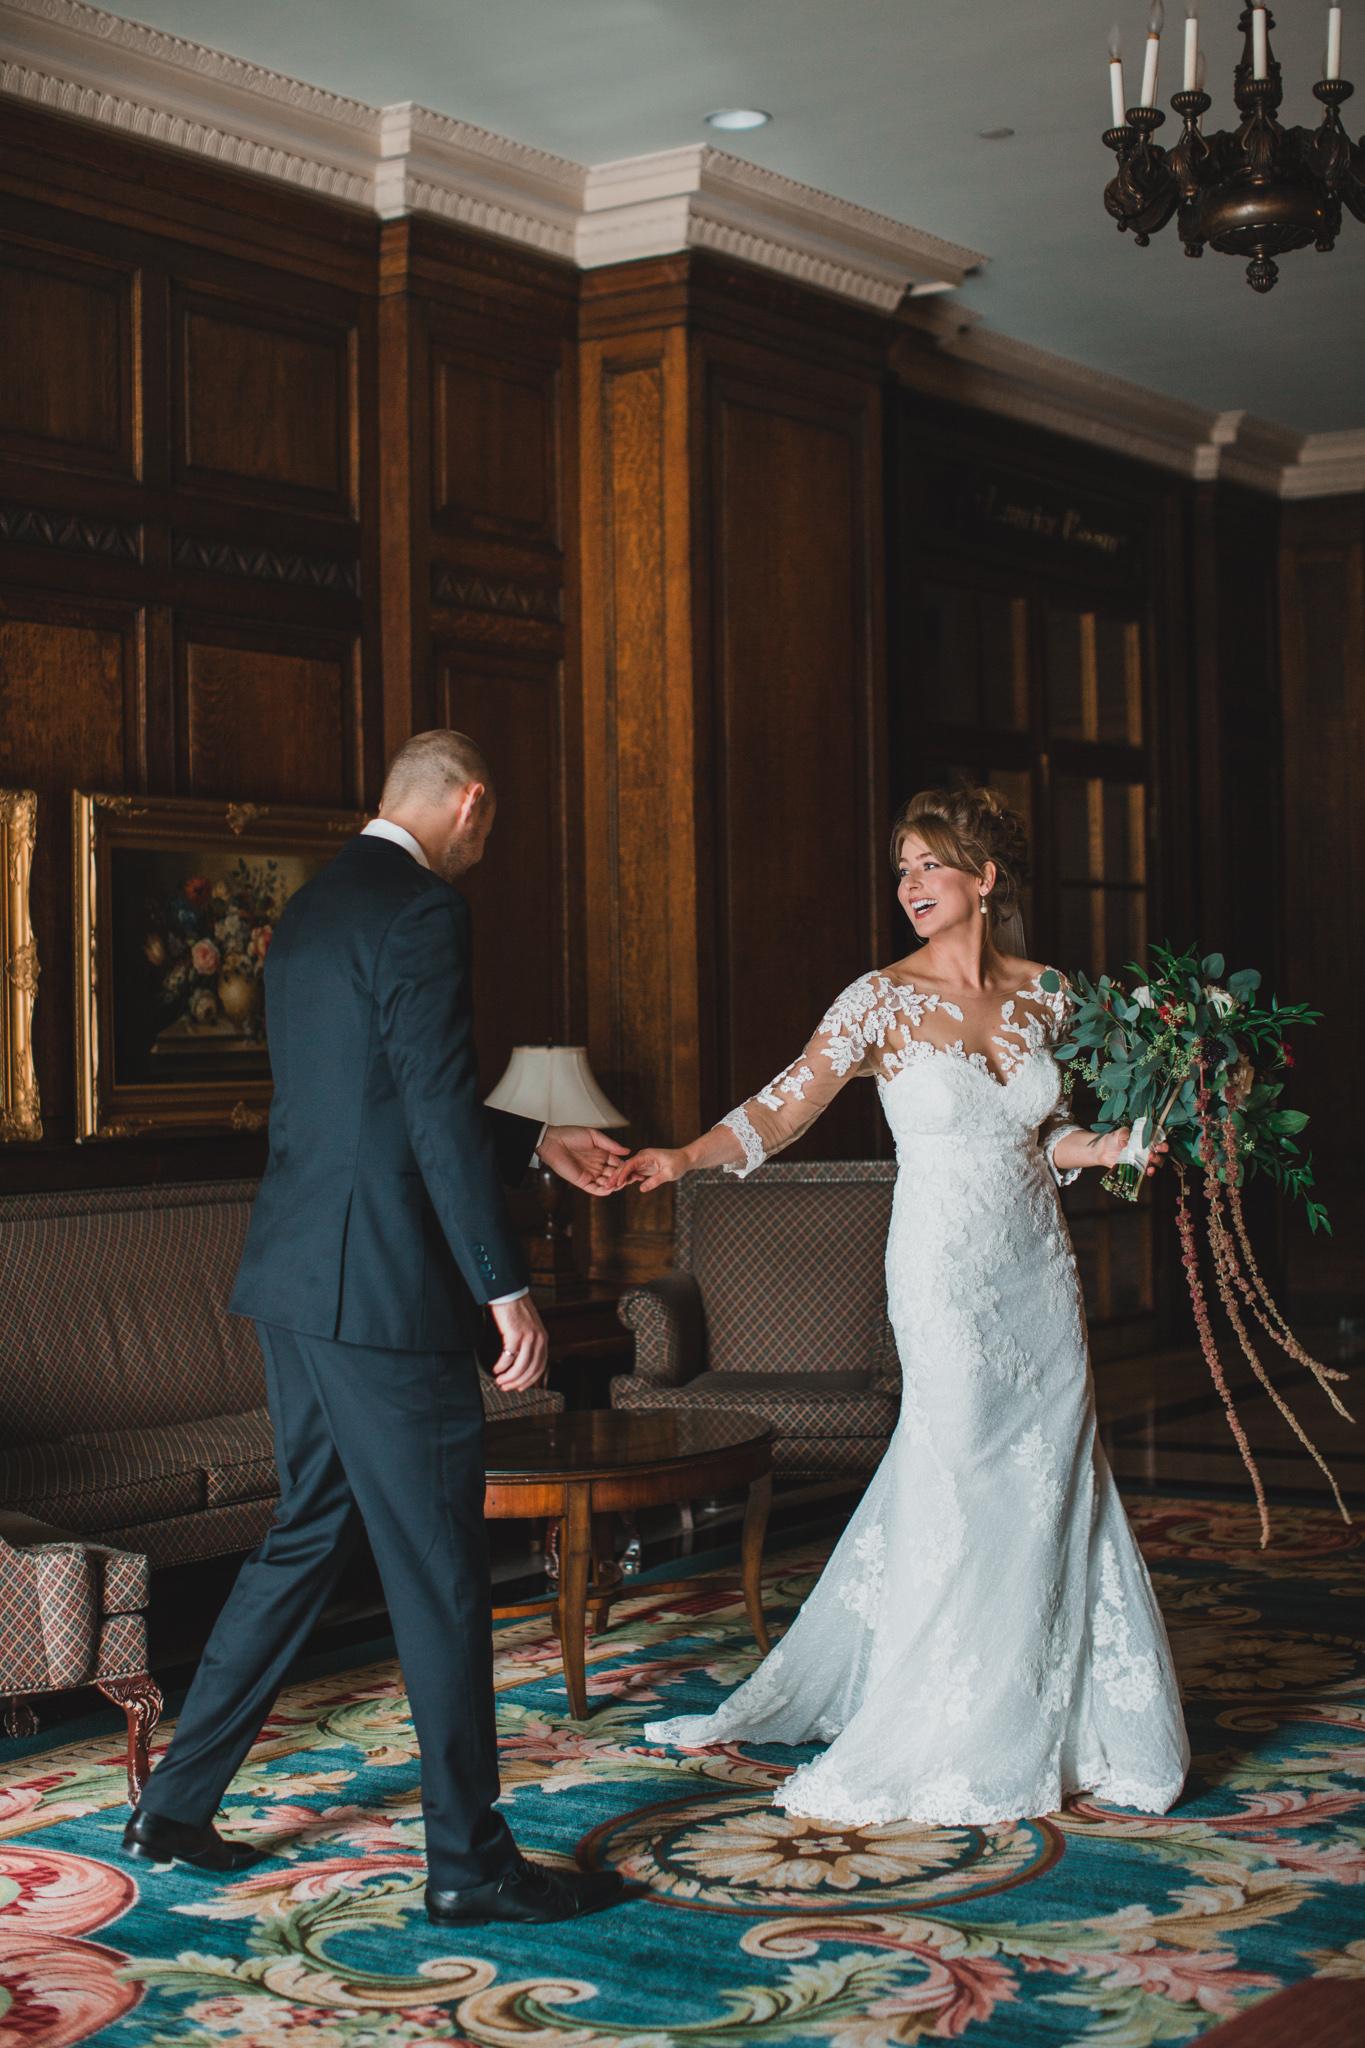 Candid, documentary style wedding photos in Ottawa